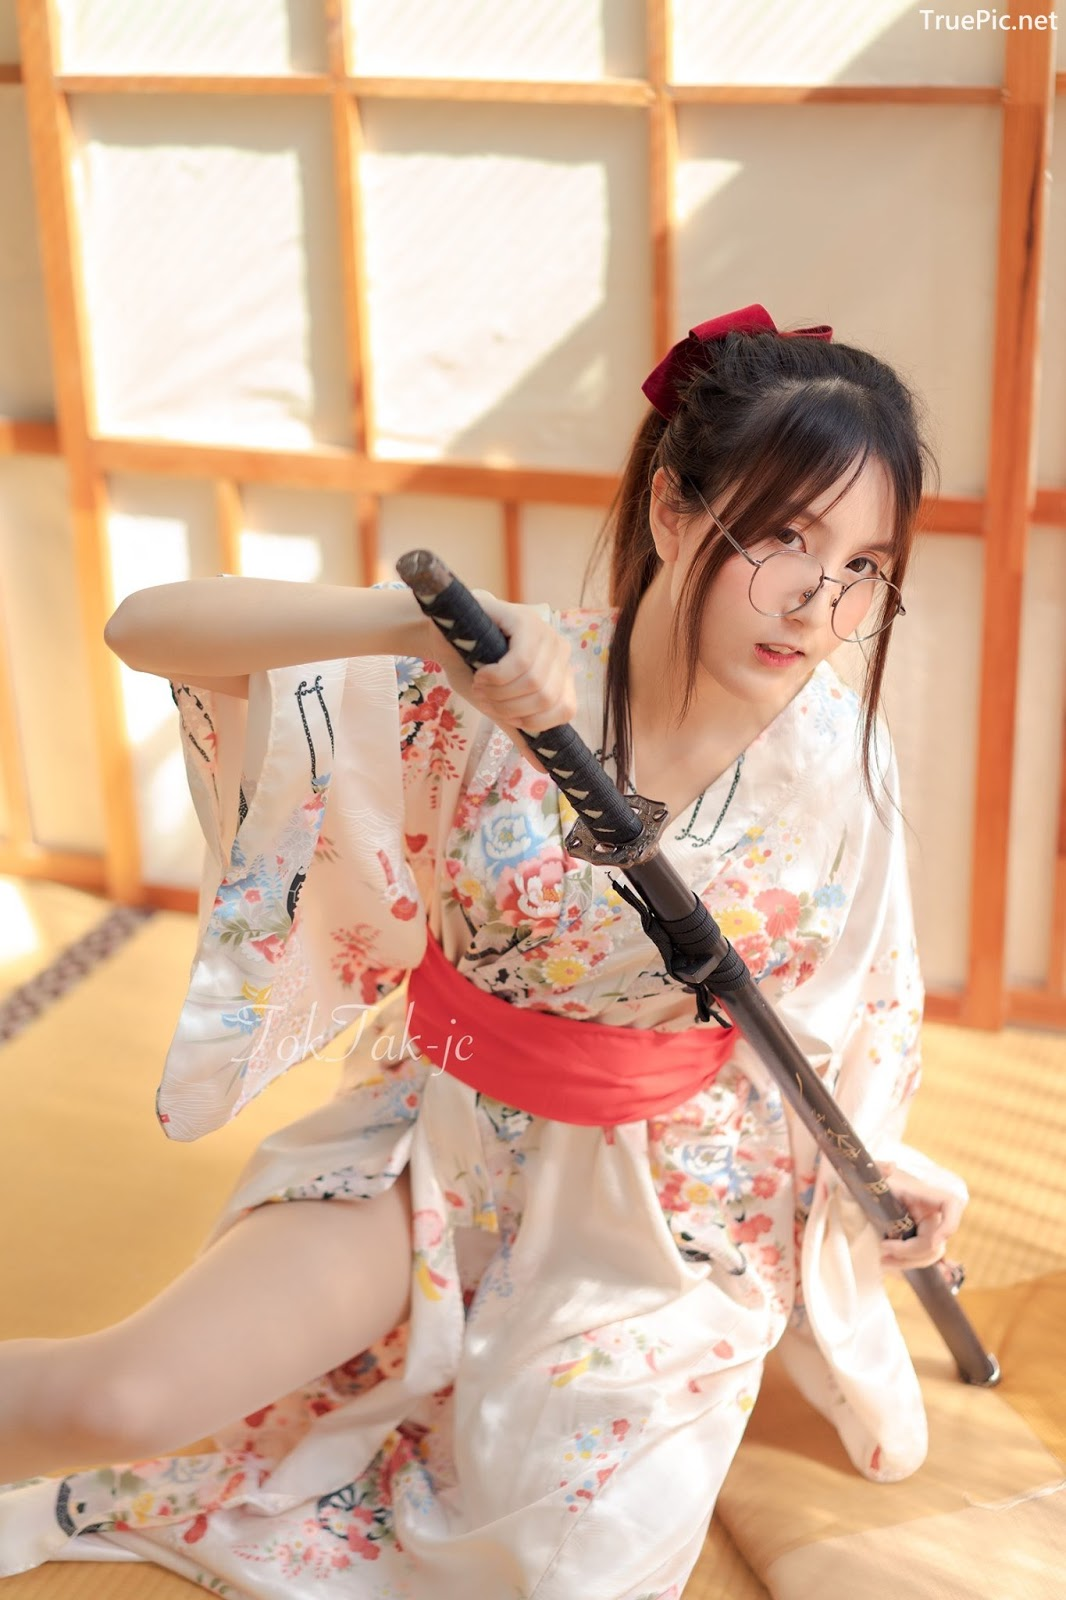 Image Thailand Model - Phunnita Intarapimai - Sexy Kendo Girl - TruePic.net - Picture-8